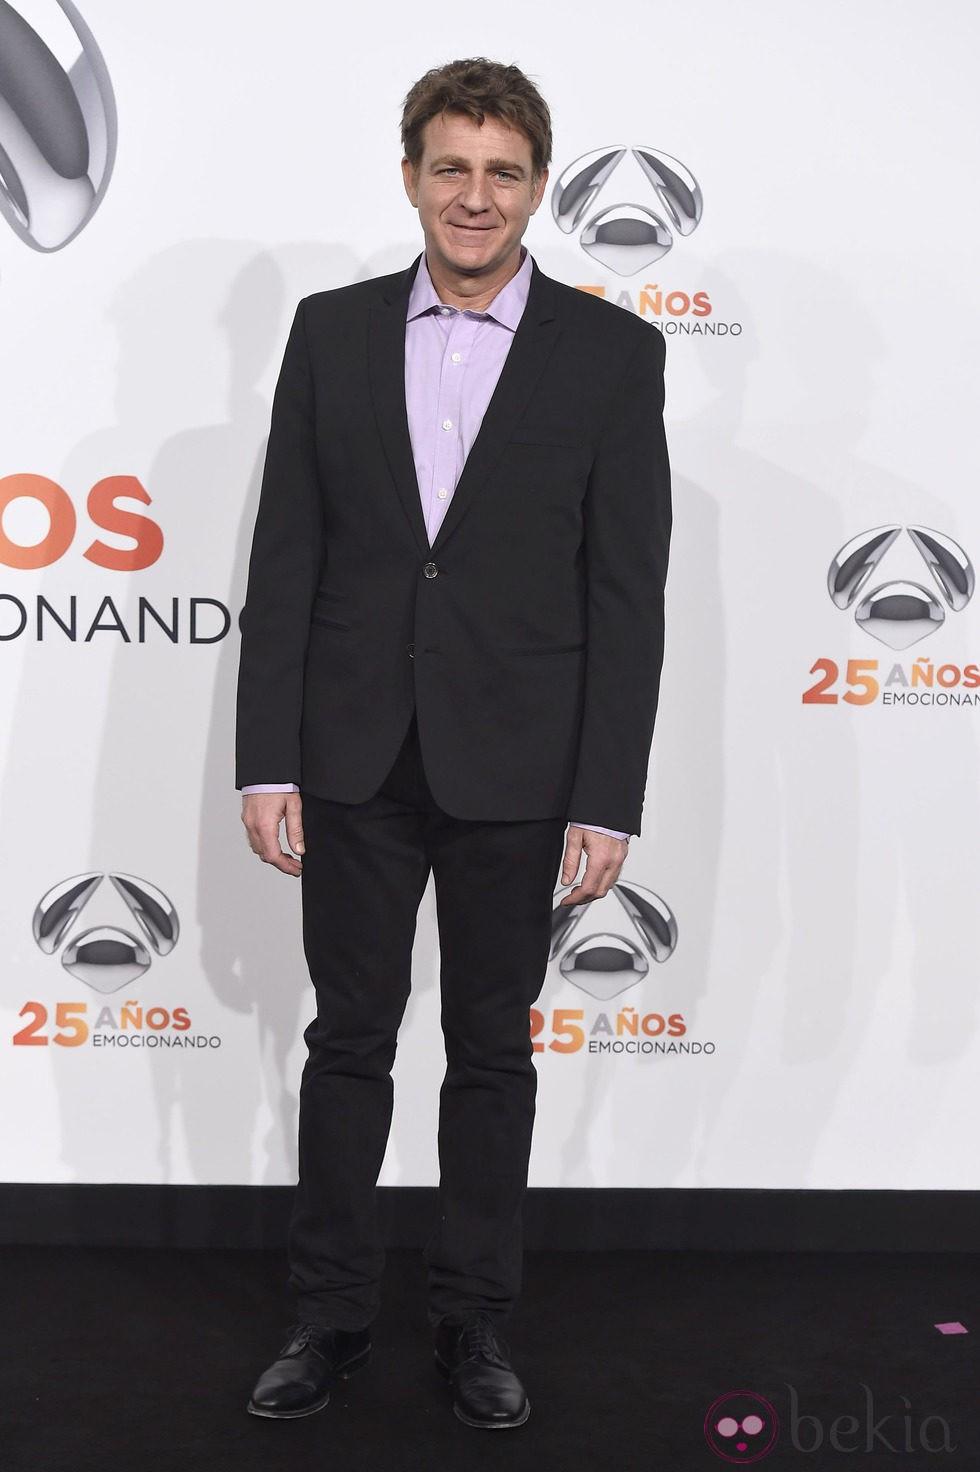 Juanjo Artero en la fiesta del 25 aniversario de Antena 3